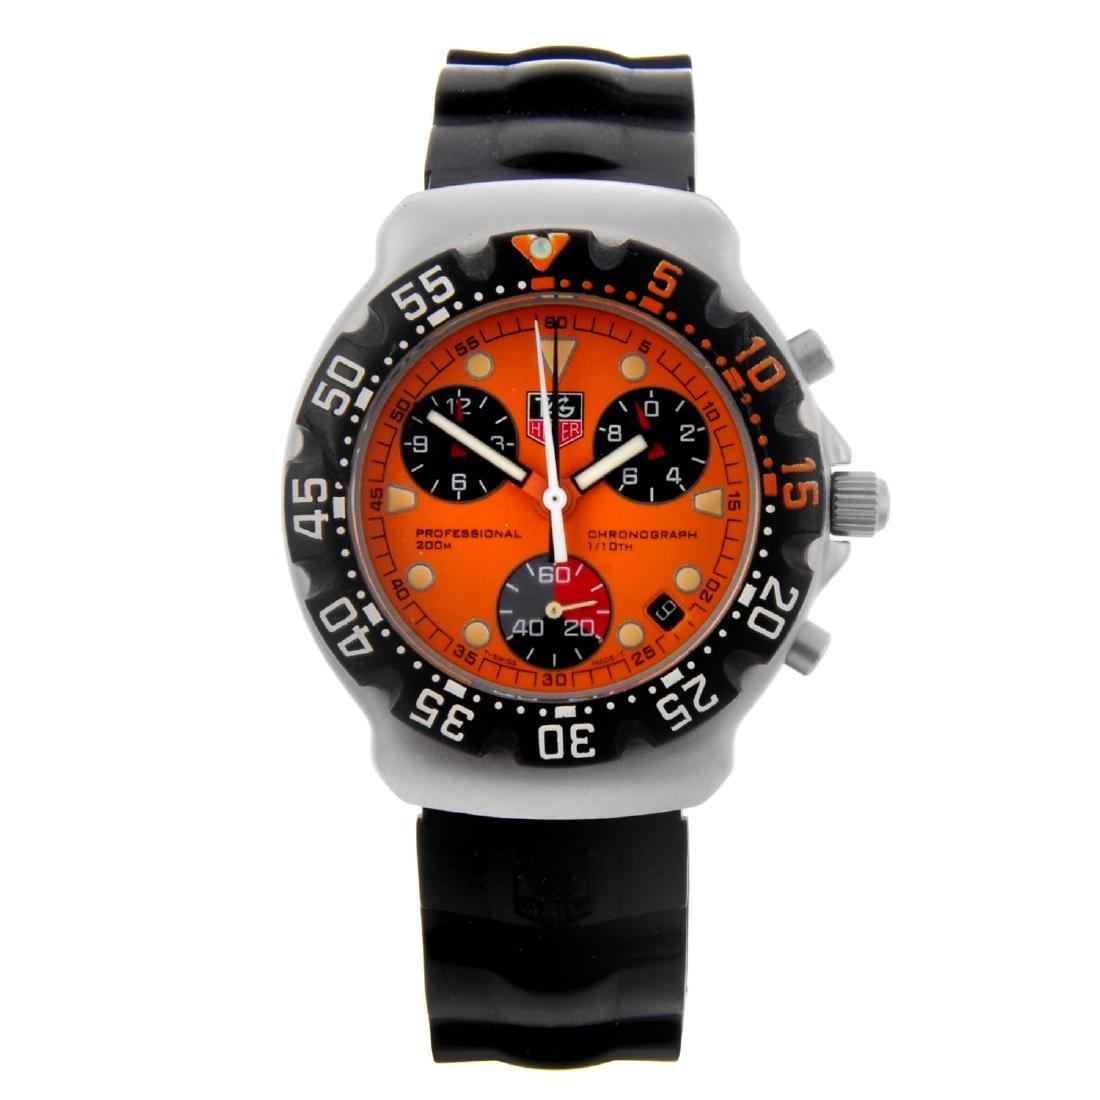 TAG HEUER - a gentleman's Formula 1 chronograph wrist